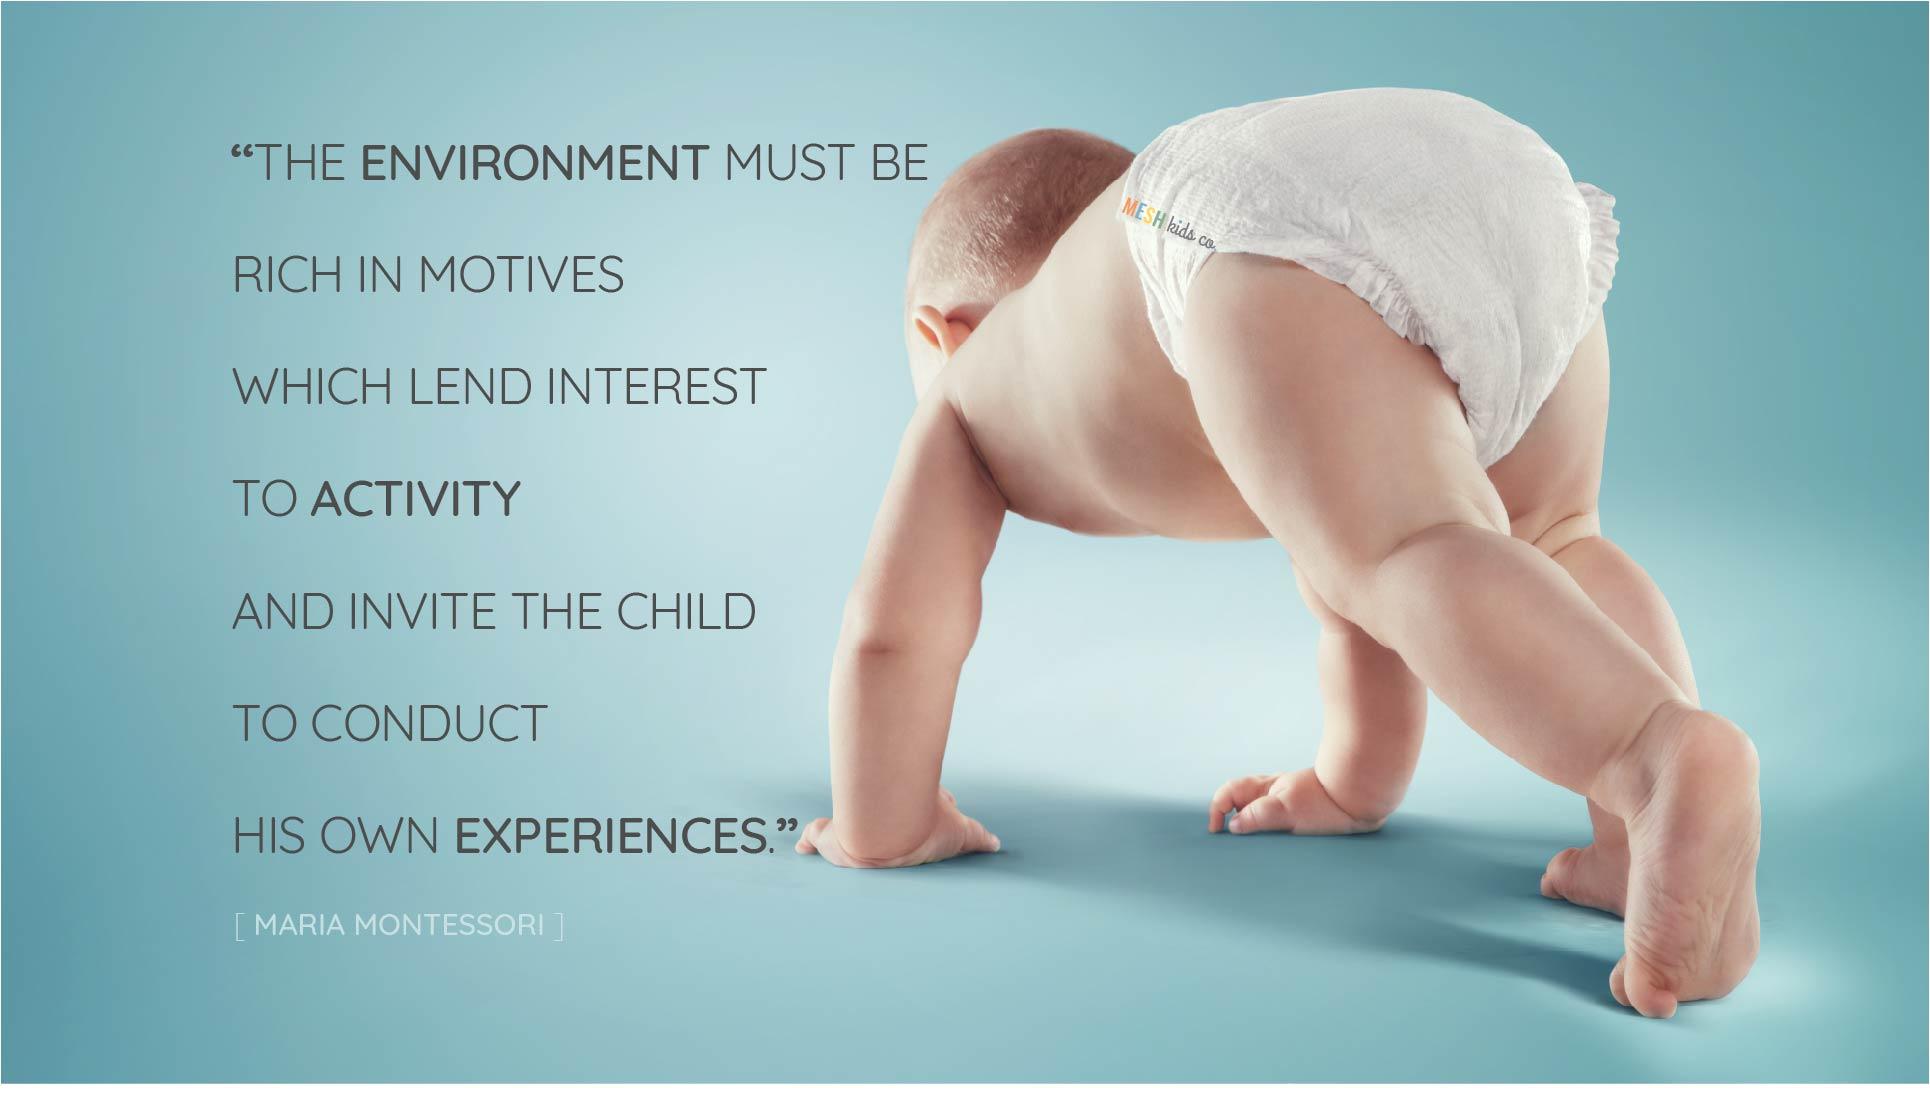 Maria Montessori Says